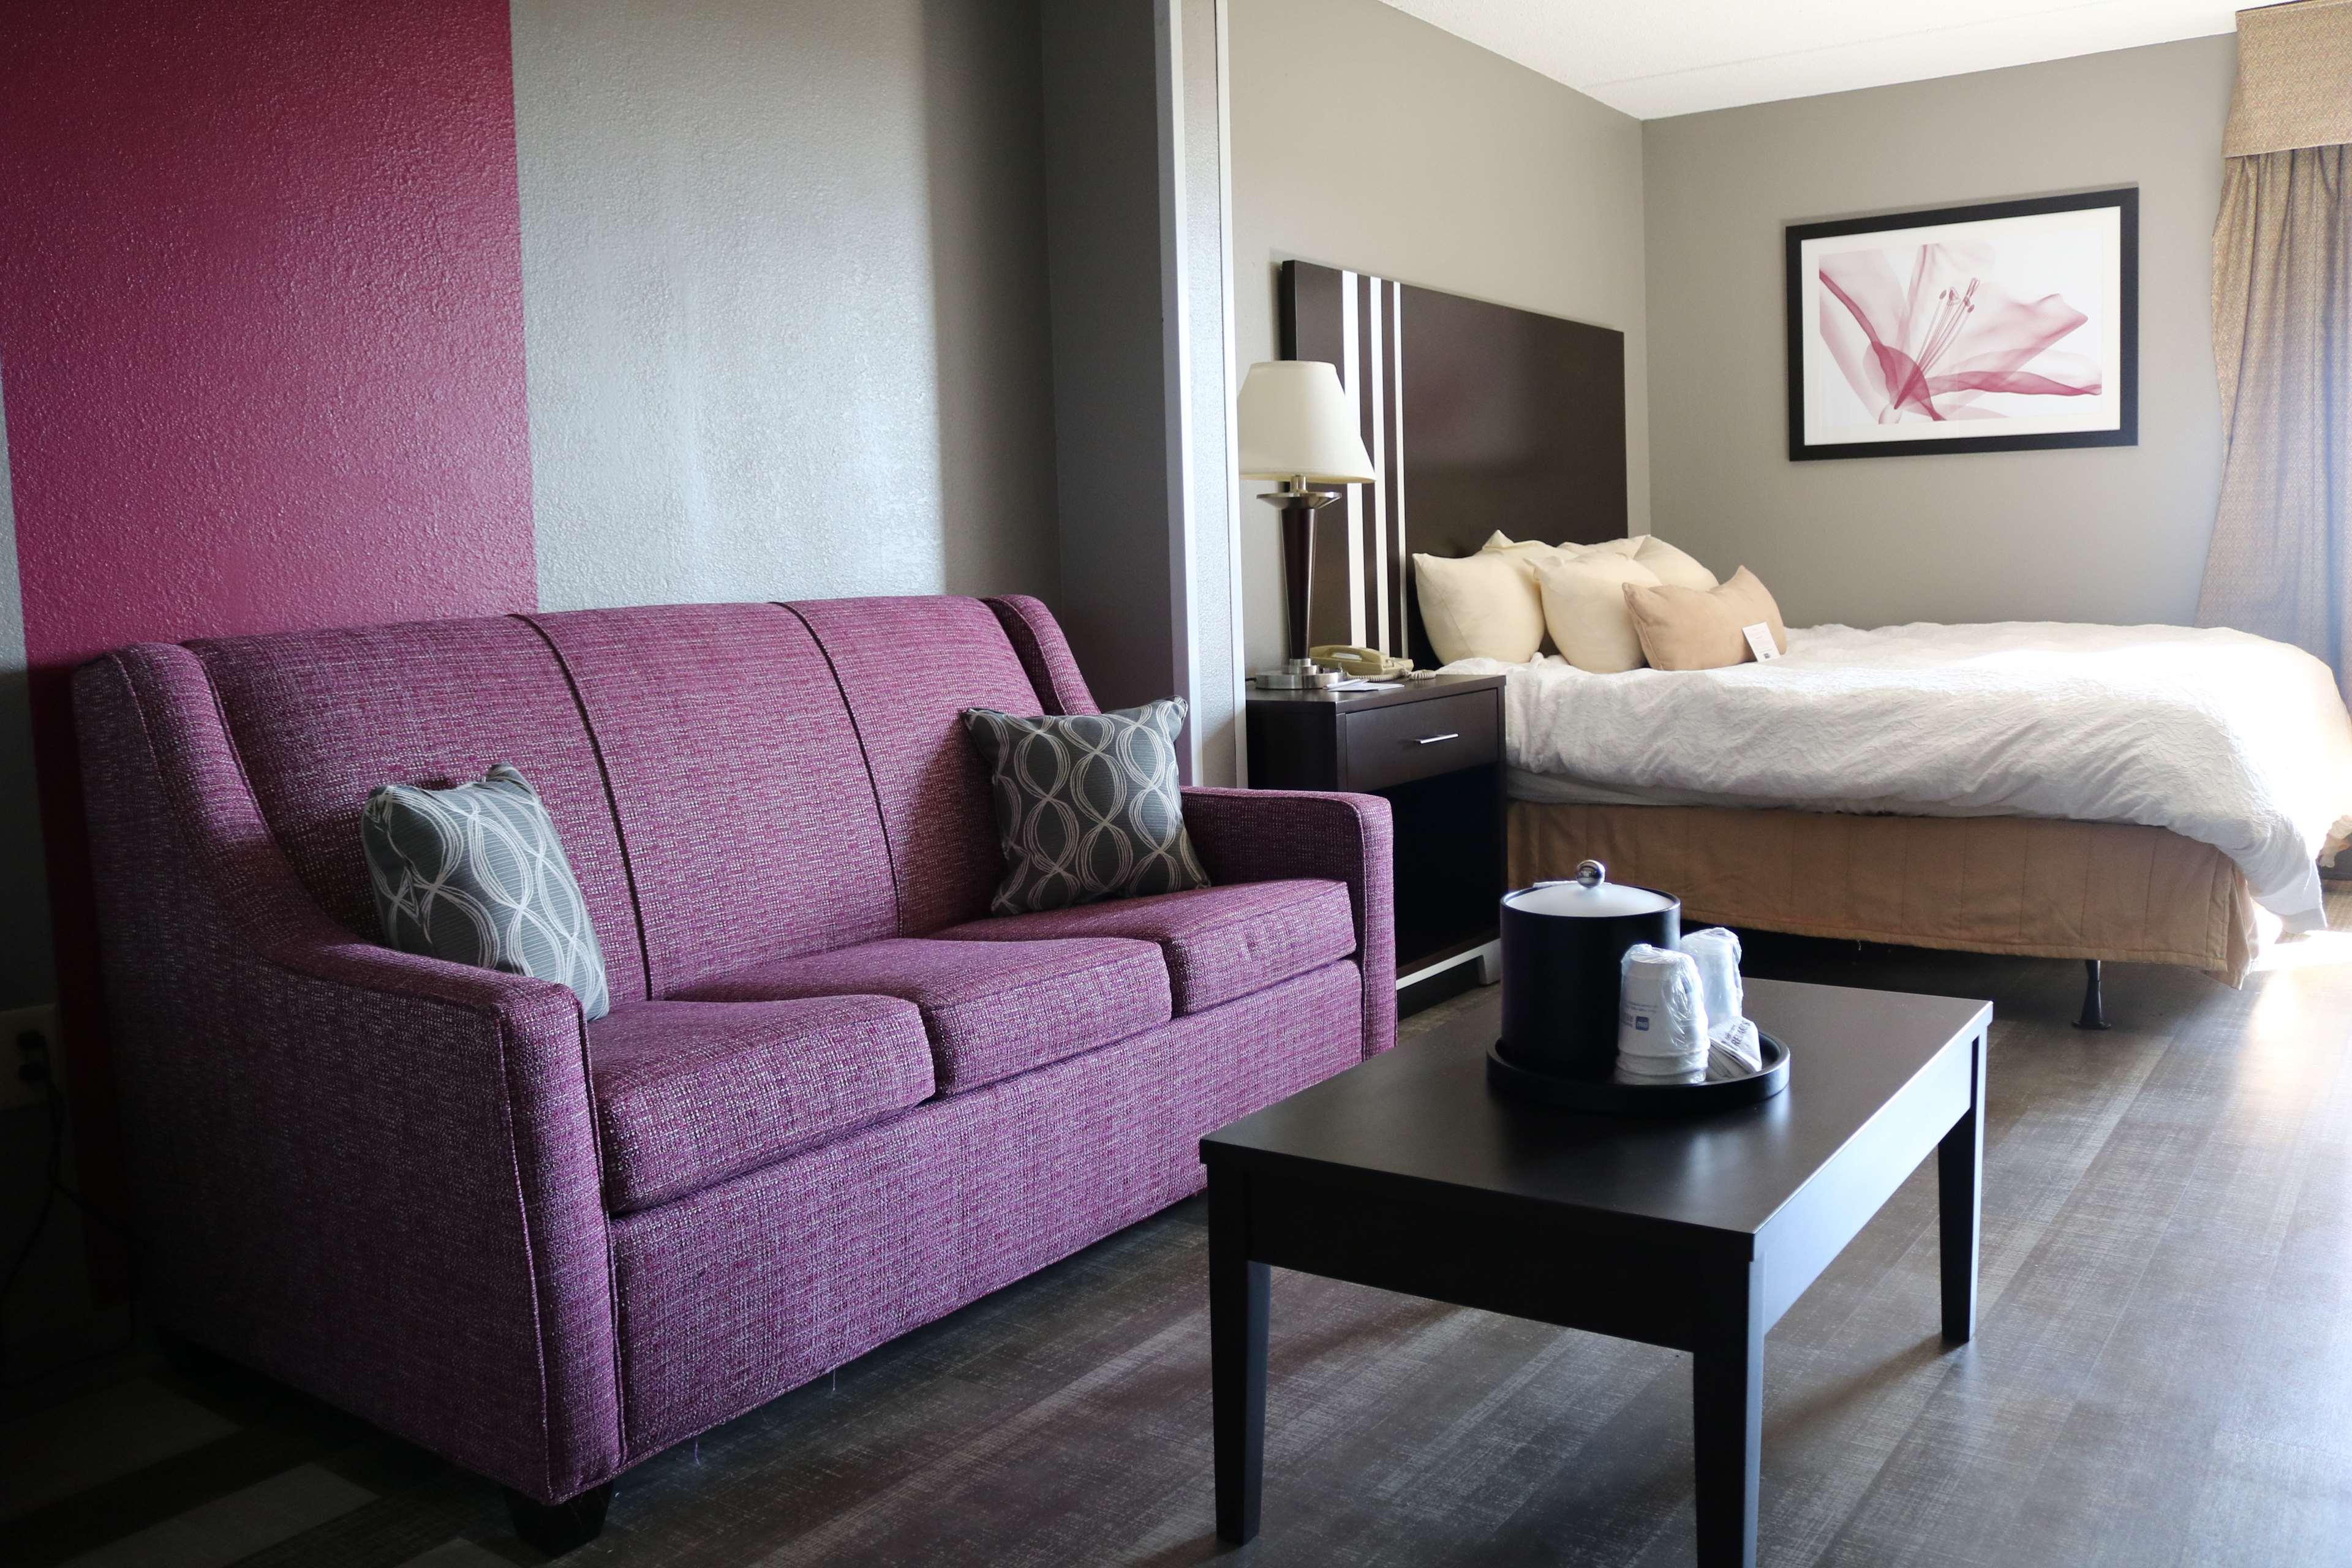 Best Western Plus Greensboro Airport Hotel image 10